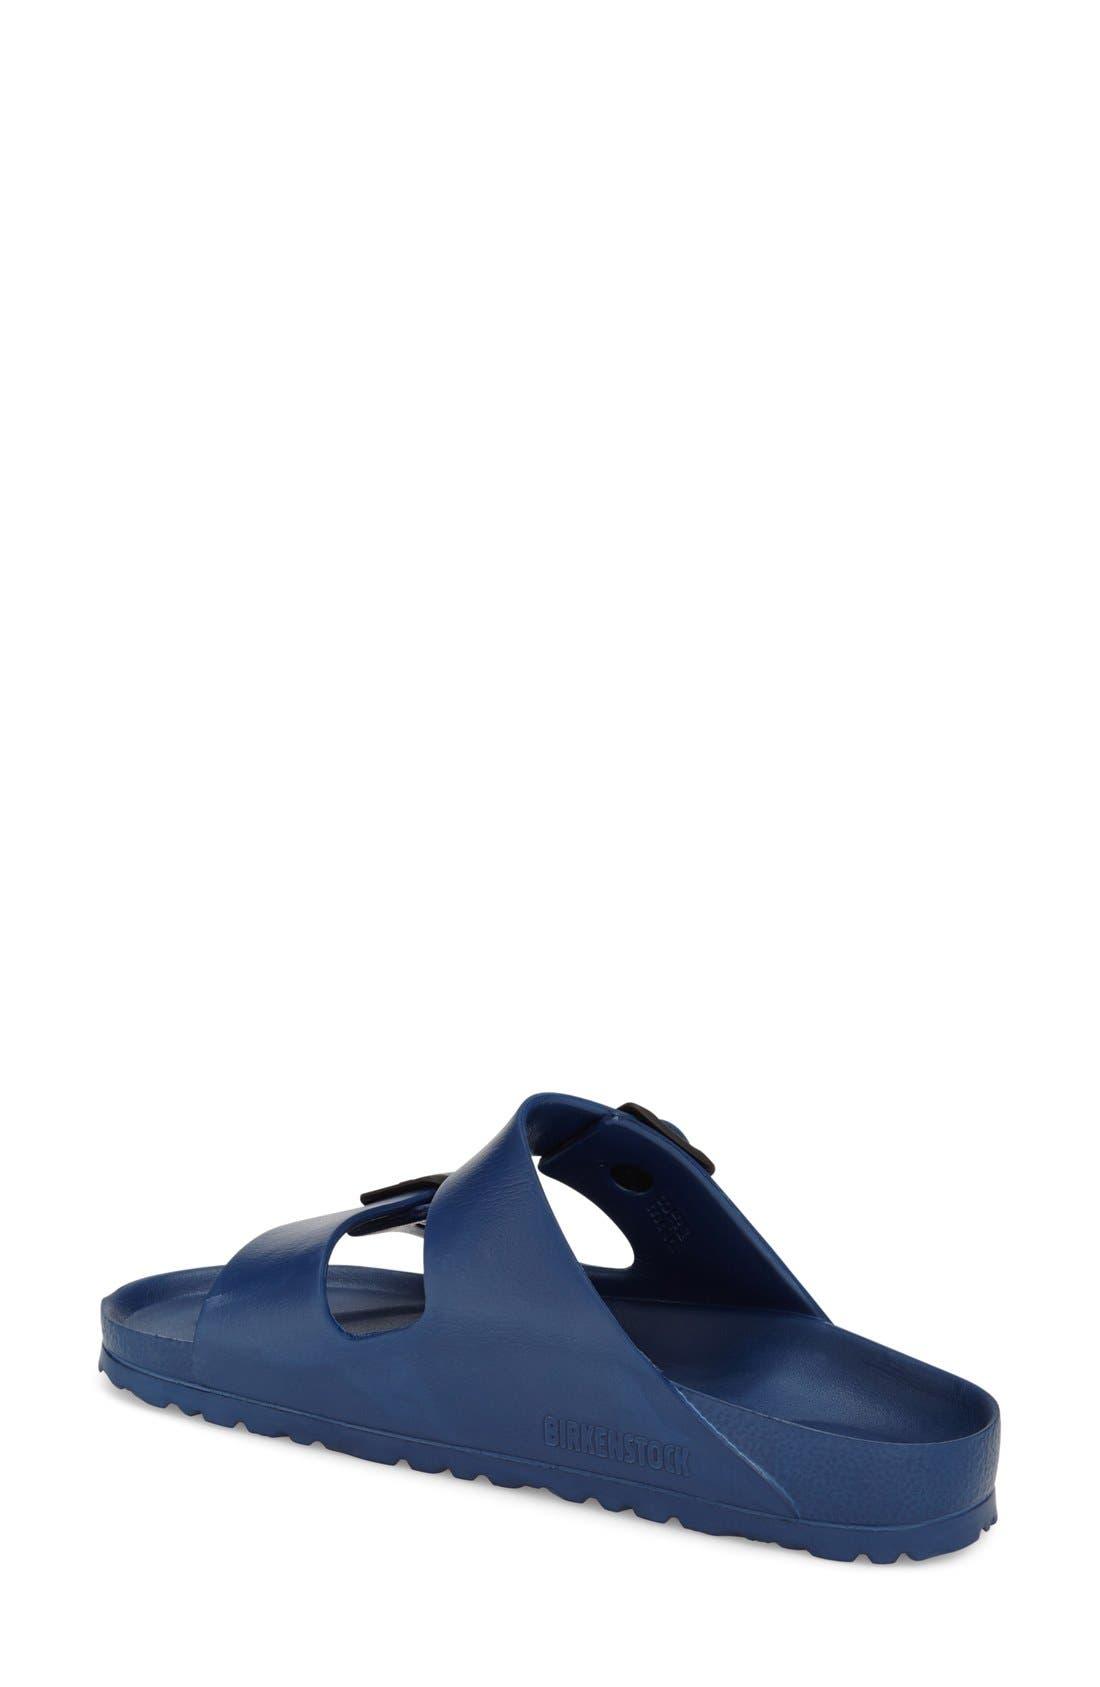 Essentials - Arizona Slide Sandal,                             Alternate thumbnail 2, color,                             Navy Eva